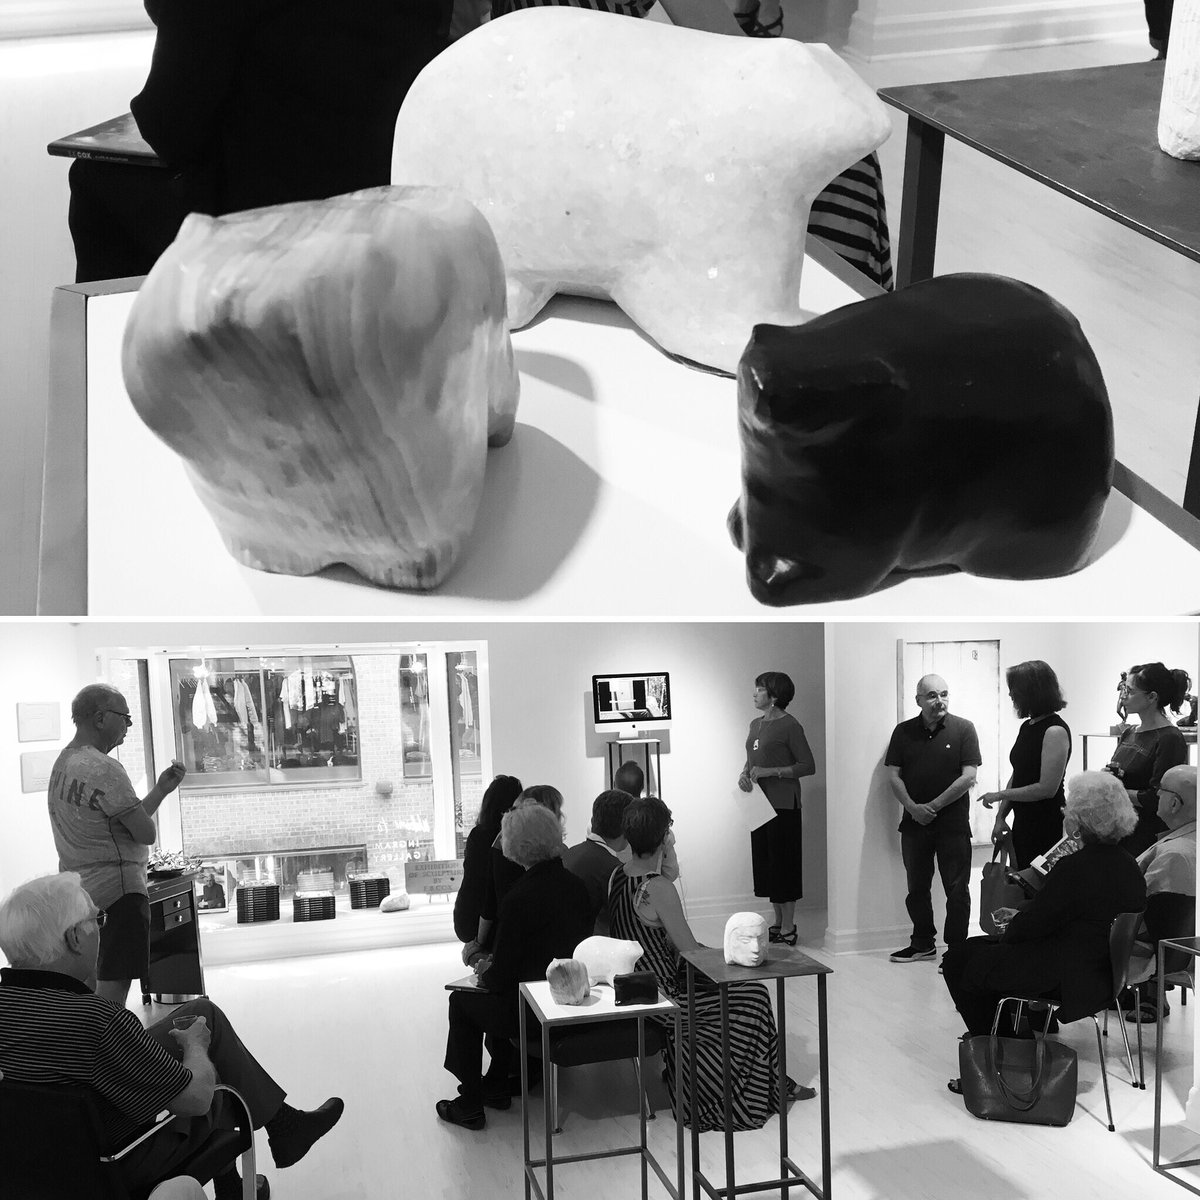 Celebrating the life+work of E.B.Cox. Daughter, Kathy Sutton tells inspired stories #IngramGallery #PublicArt  https:// en.m.wikipedia.org/wiki/E.B._Cox  &nbsp;   #EBCox<br>http://pic.twitter.com/suuvNuKoZc &ndash; at Ingram Gallery